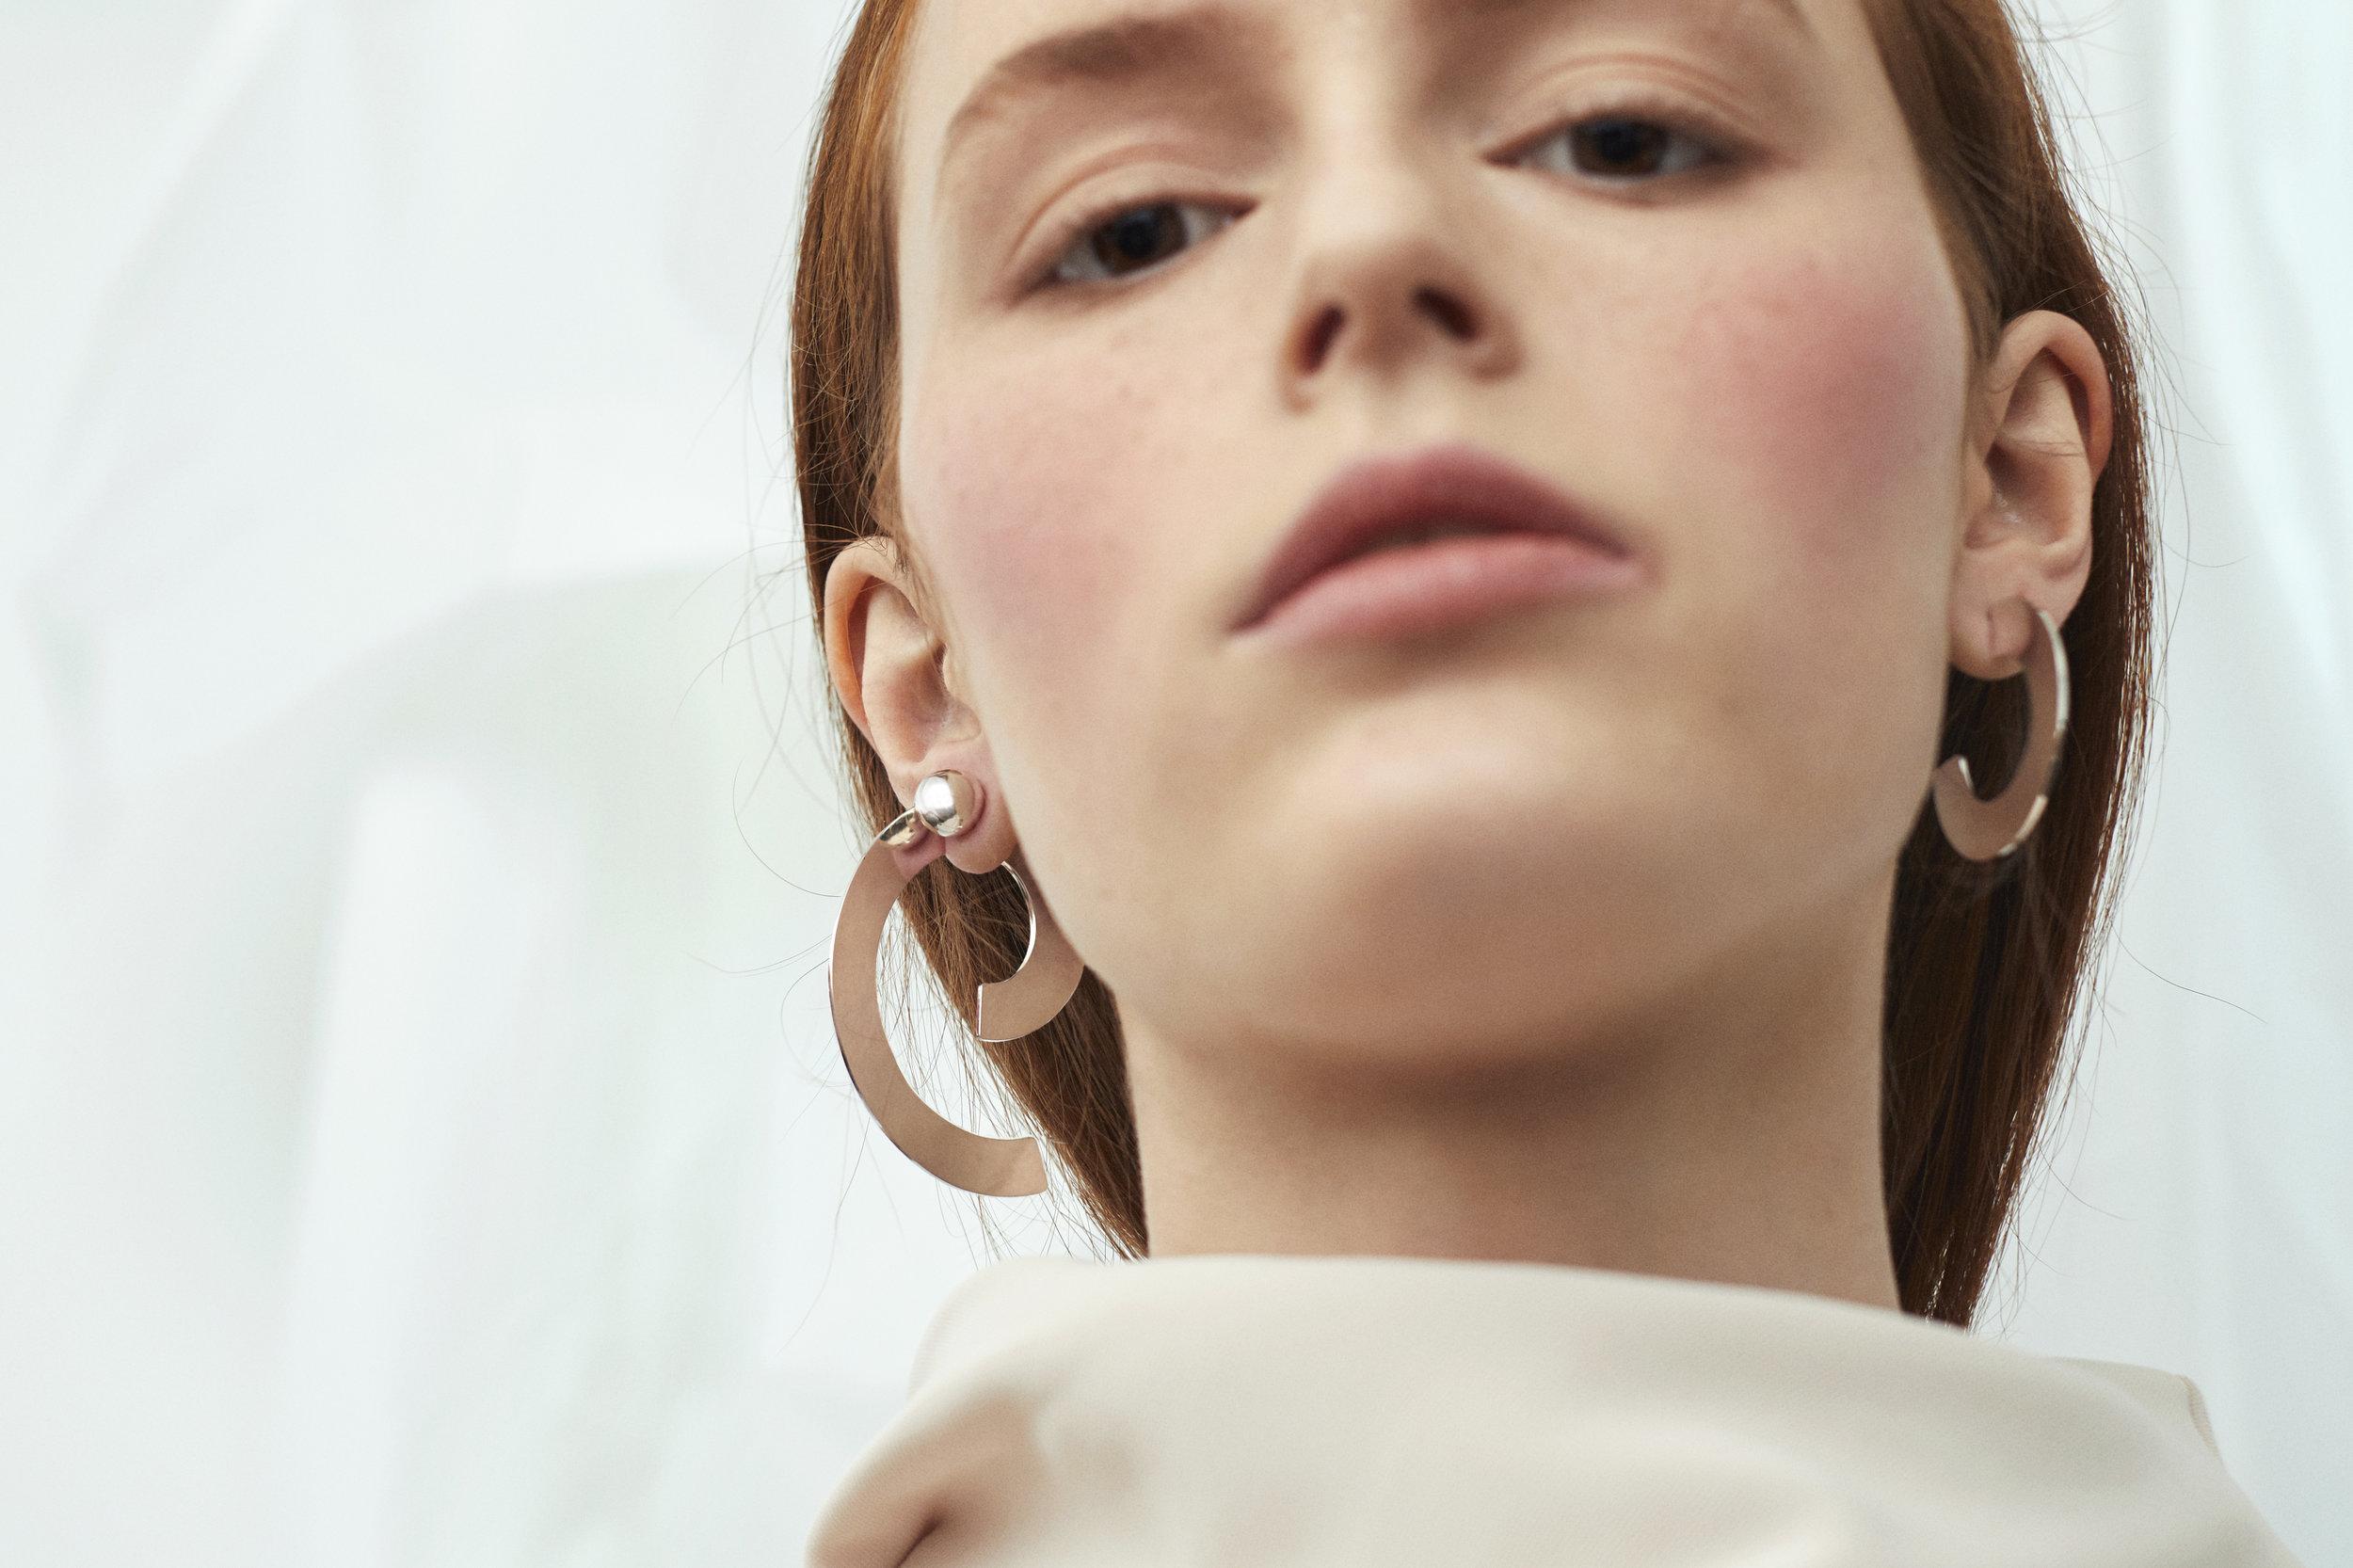 ▲ SIGMA earring set, ZETA earring